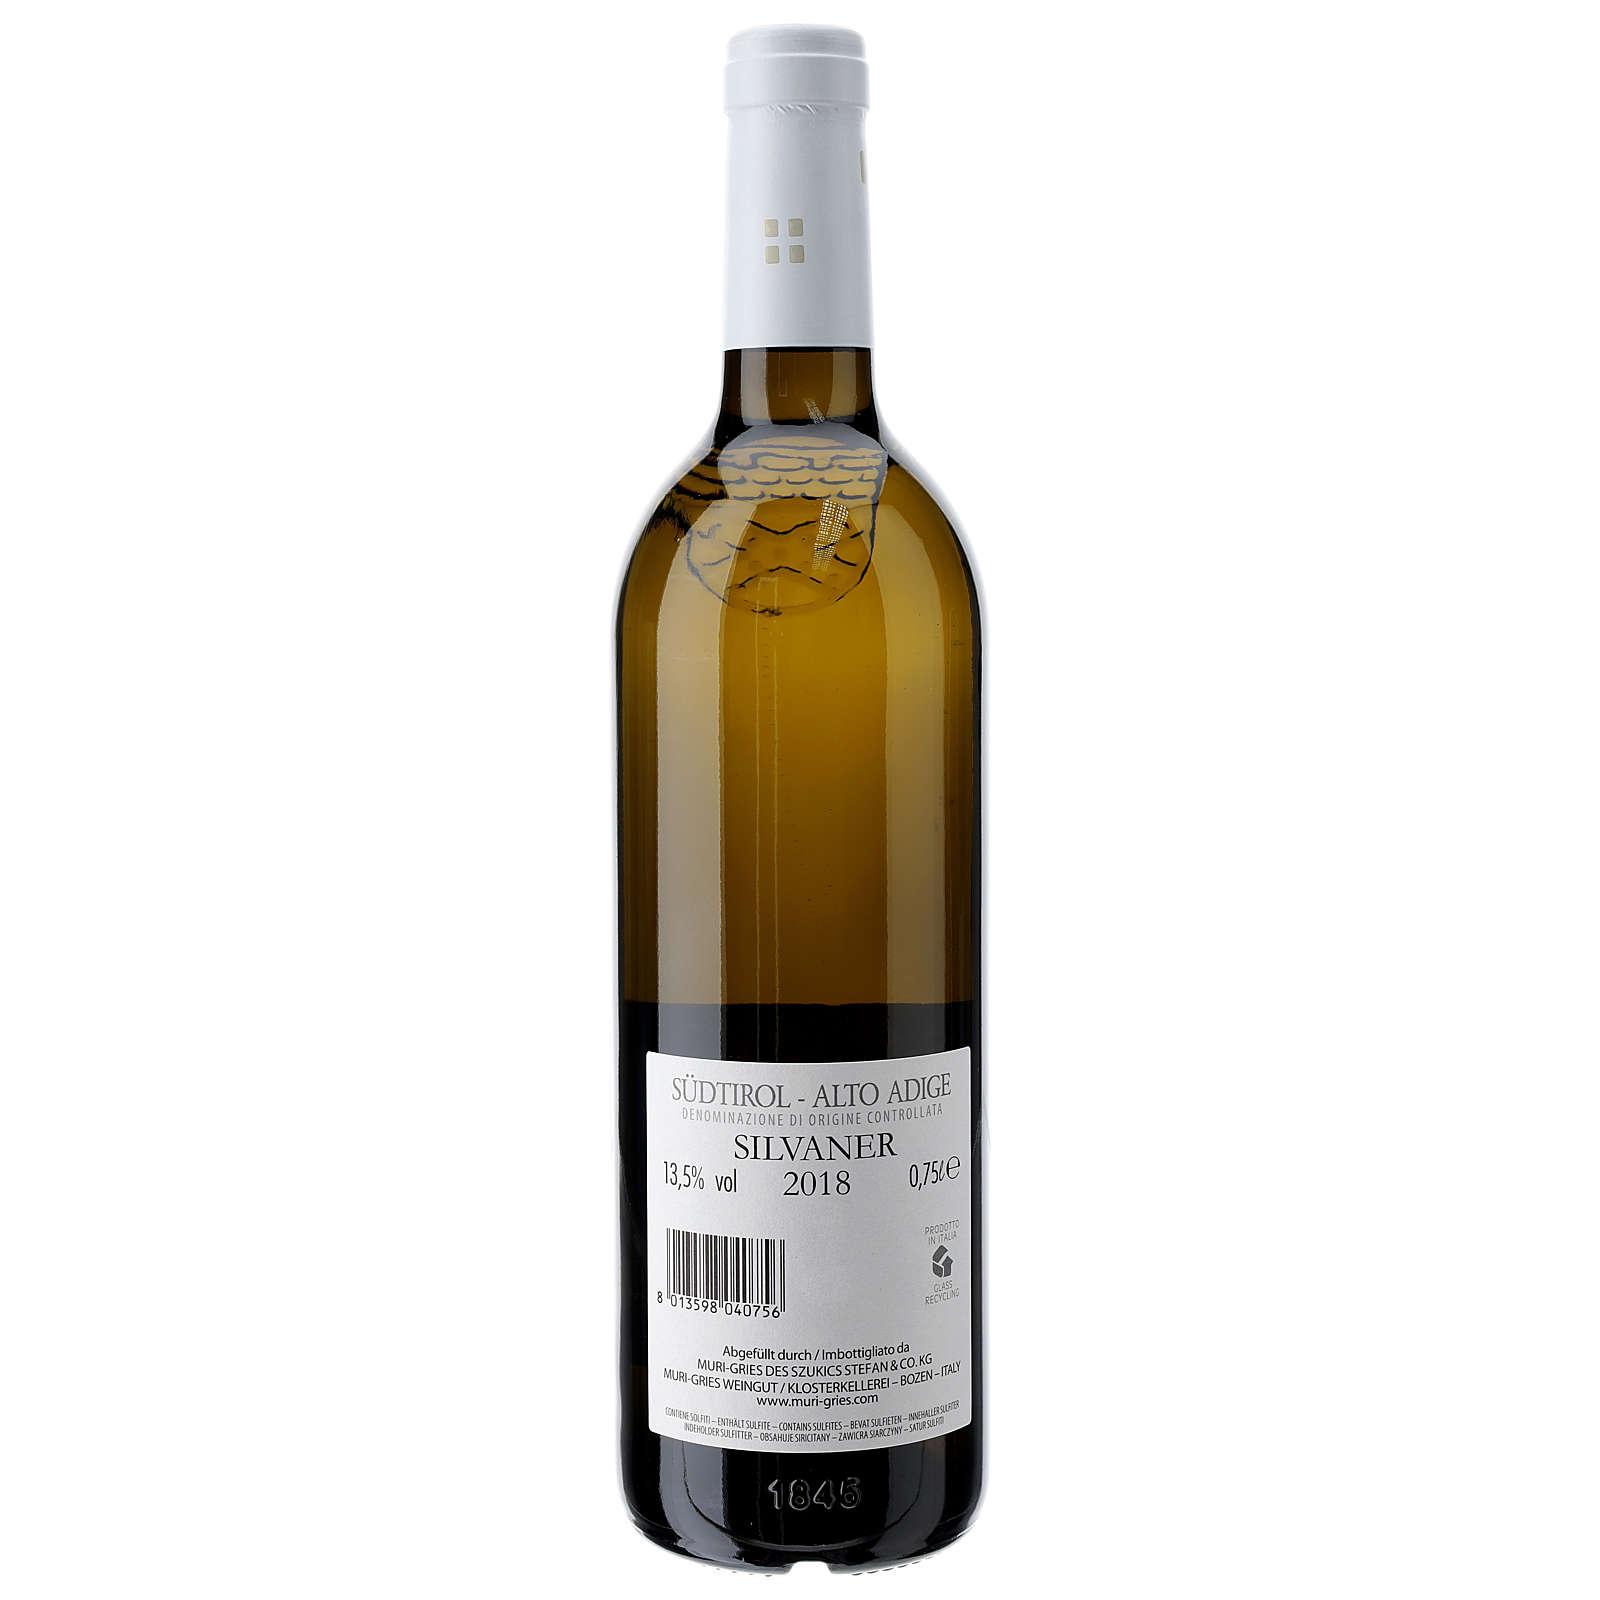 Vino Silvaner DOC 2018 Abadía Muri Gries 750 ml 3